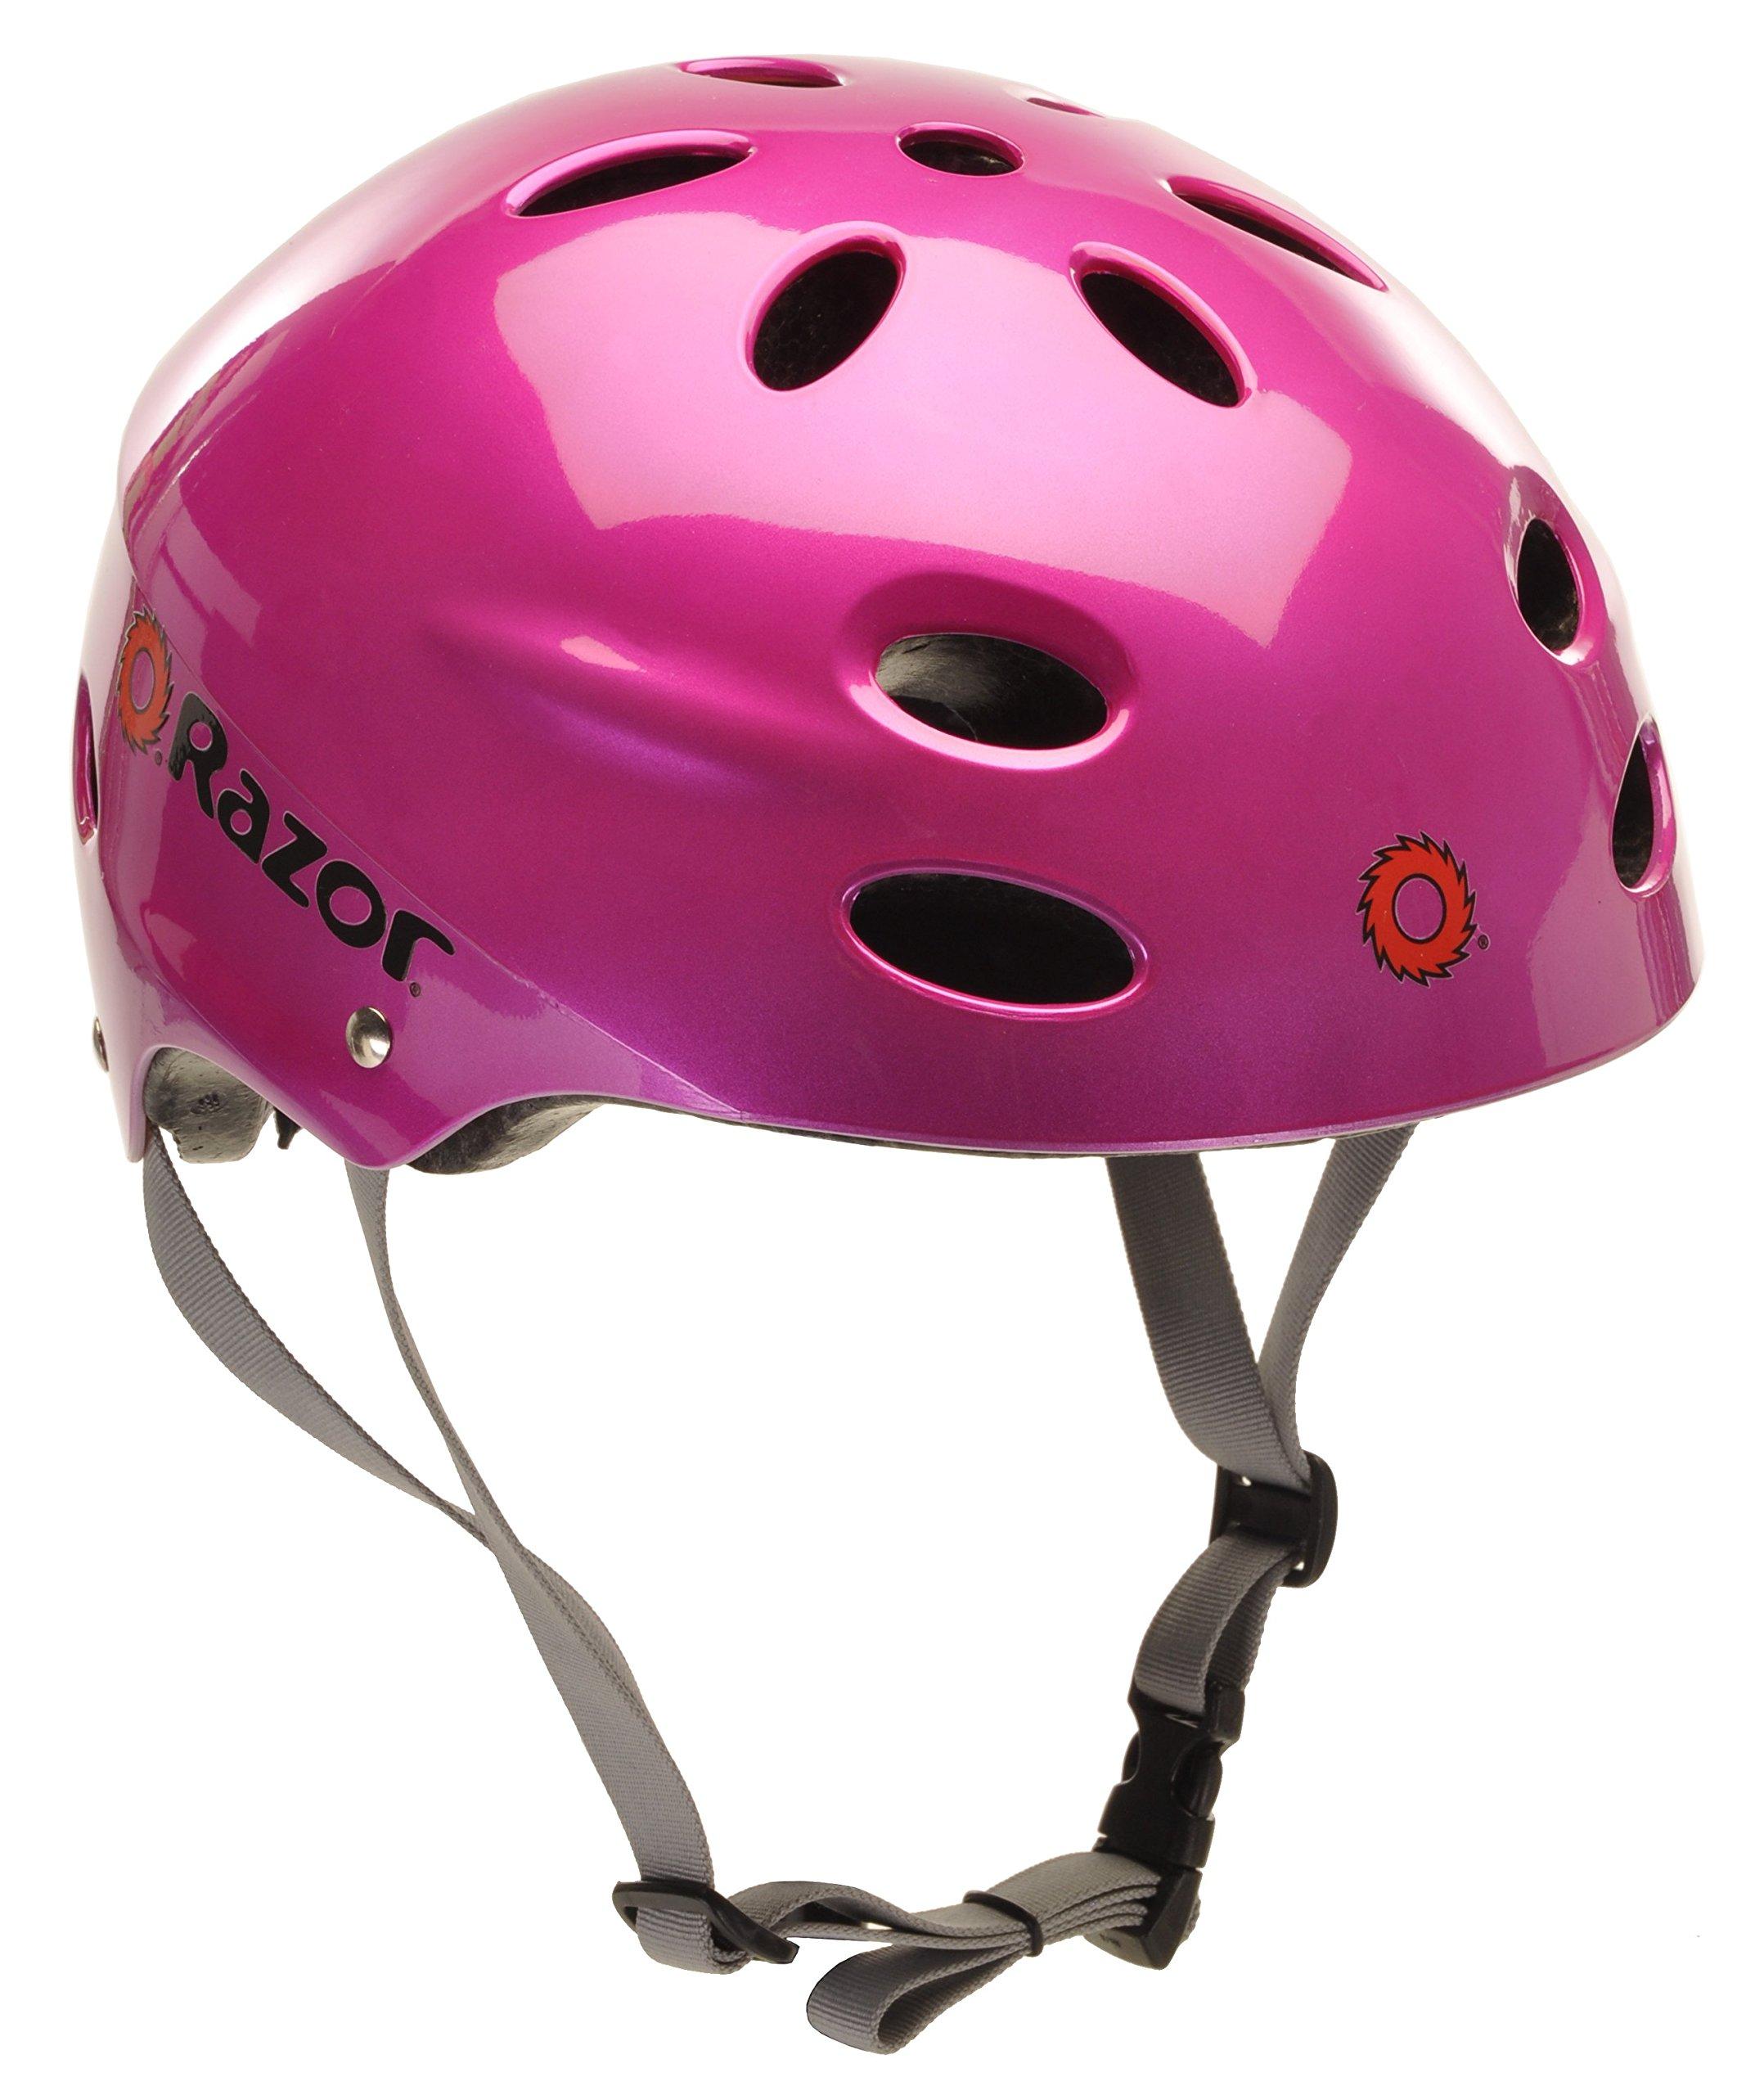 Razor V-17 Youth Multi-Sport Helmet, Magenta